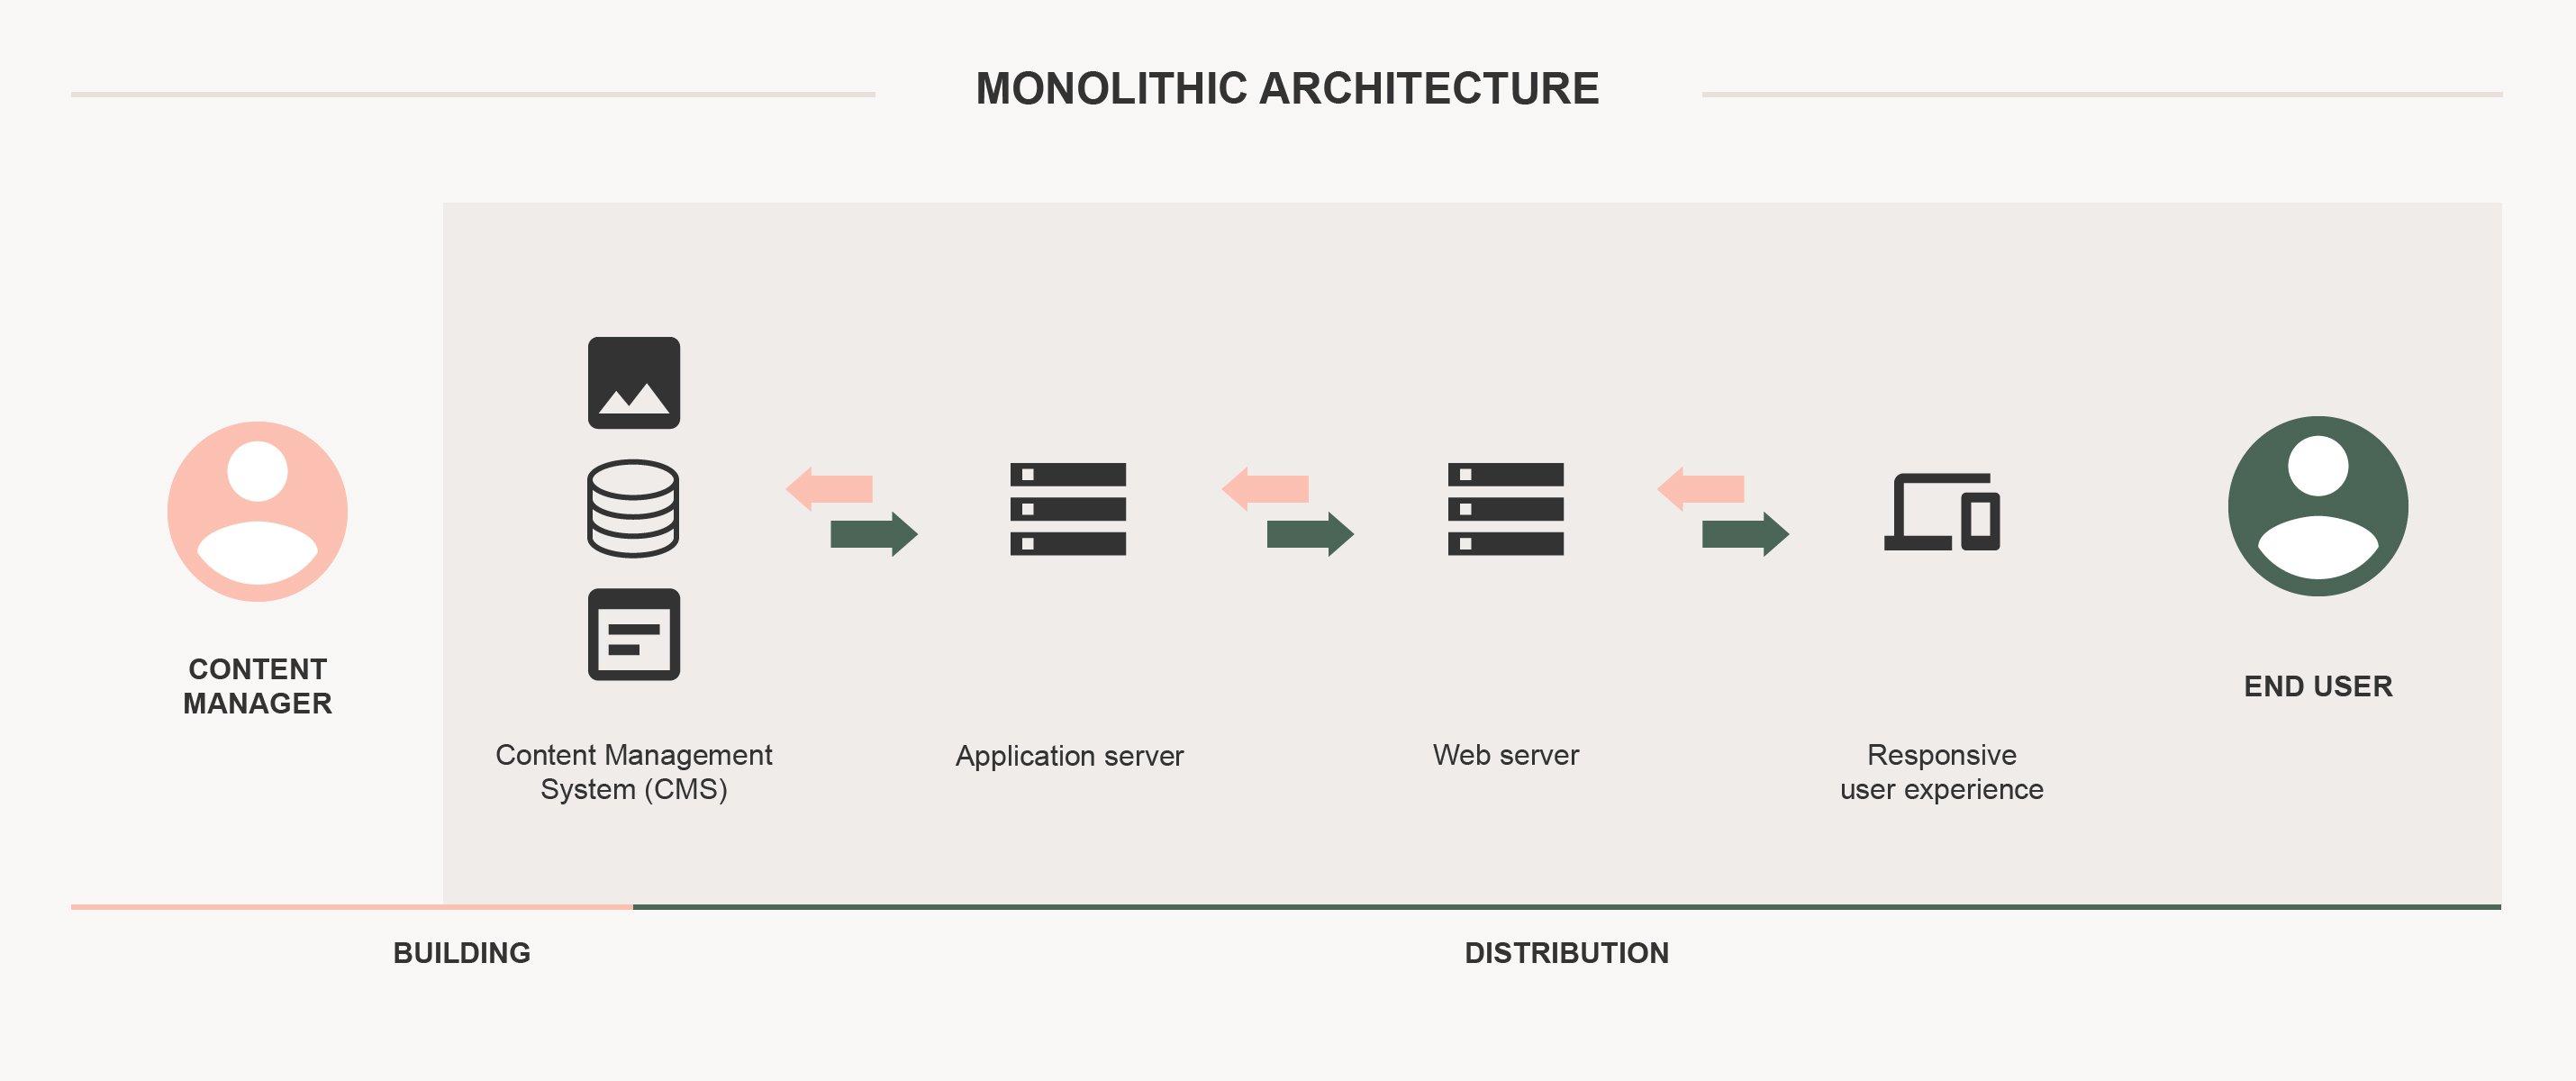 architecture-monolithic@2x